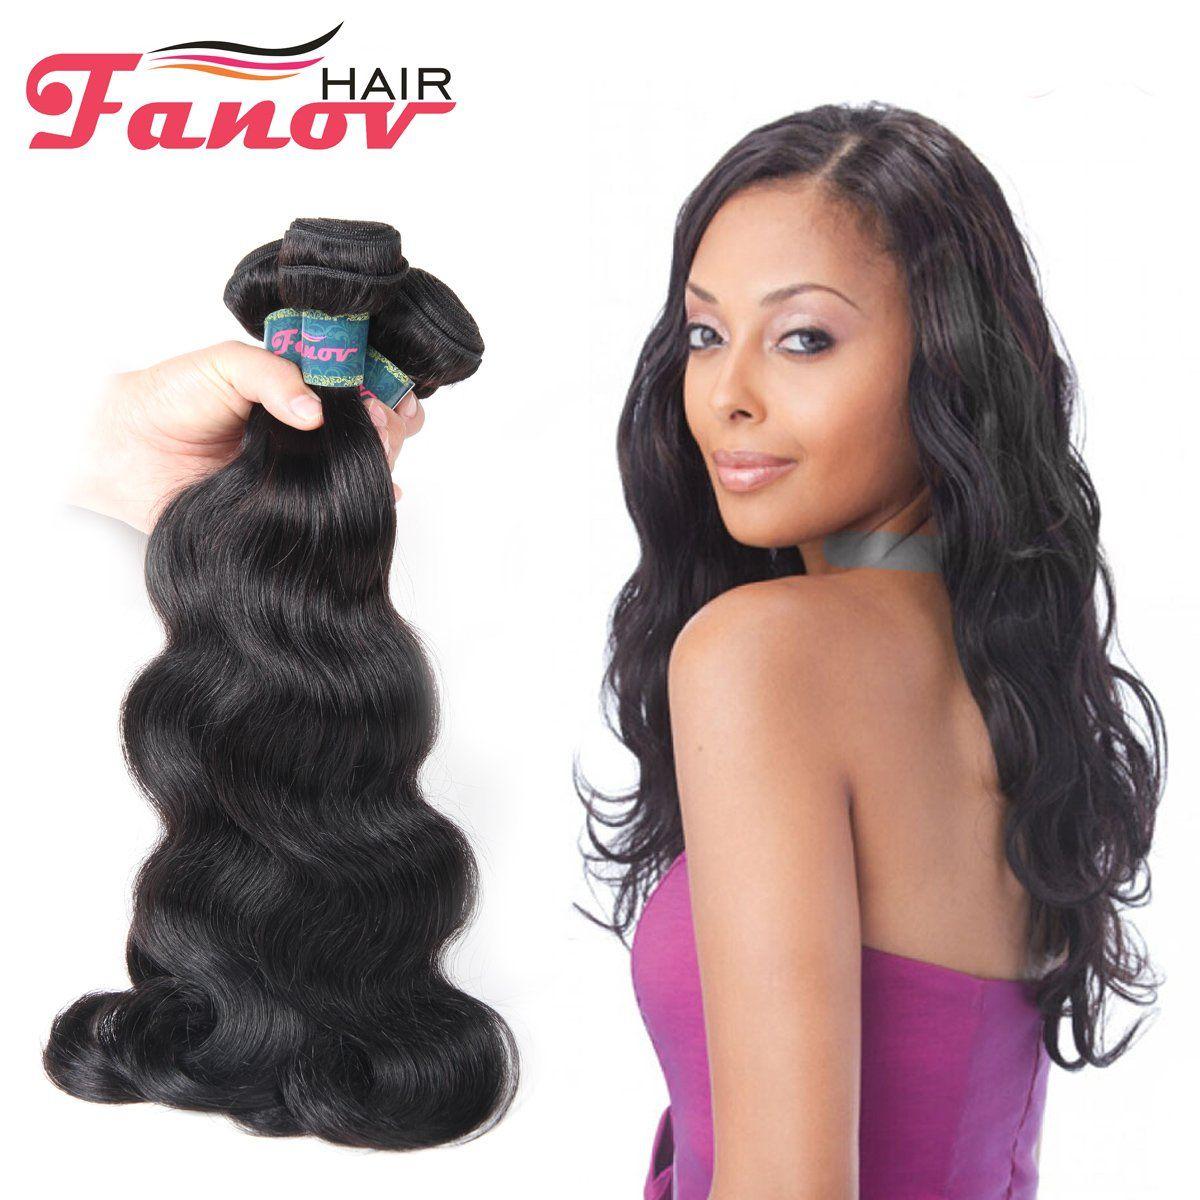 Unprocessed Brazilian Body Wave Remy Hair Natual 22 24 26 Black